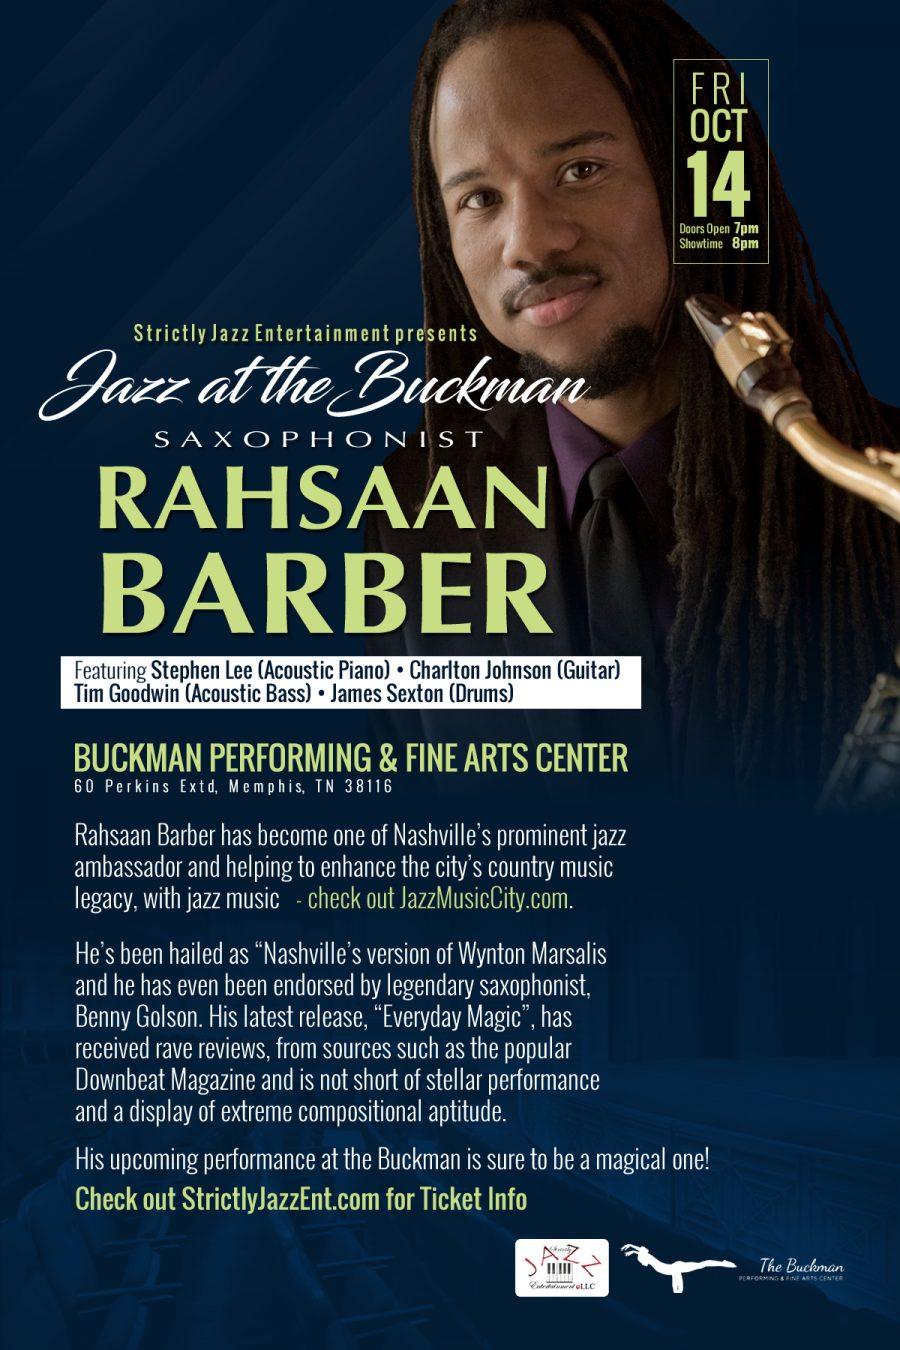 flyer-buckman-rahsaan-barber-4x6